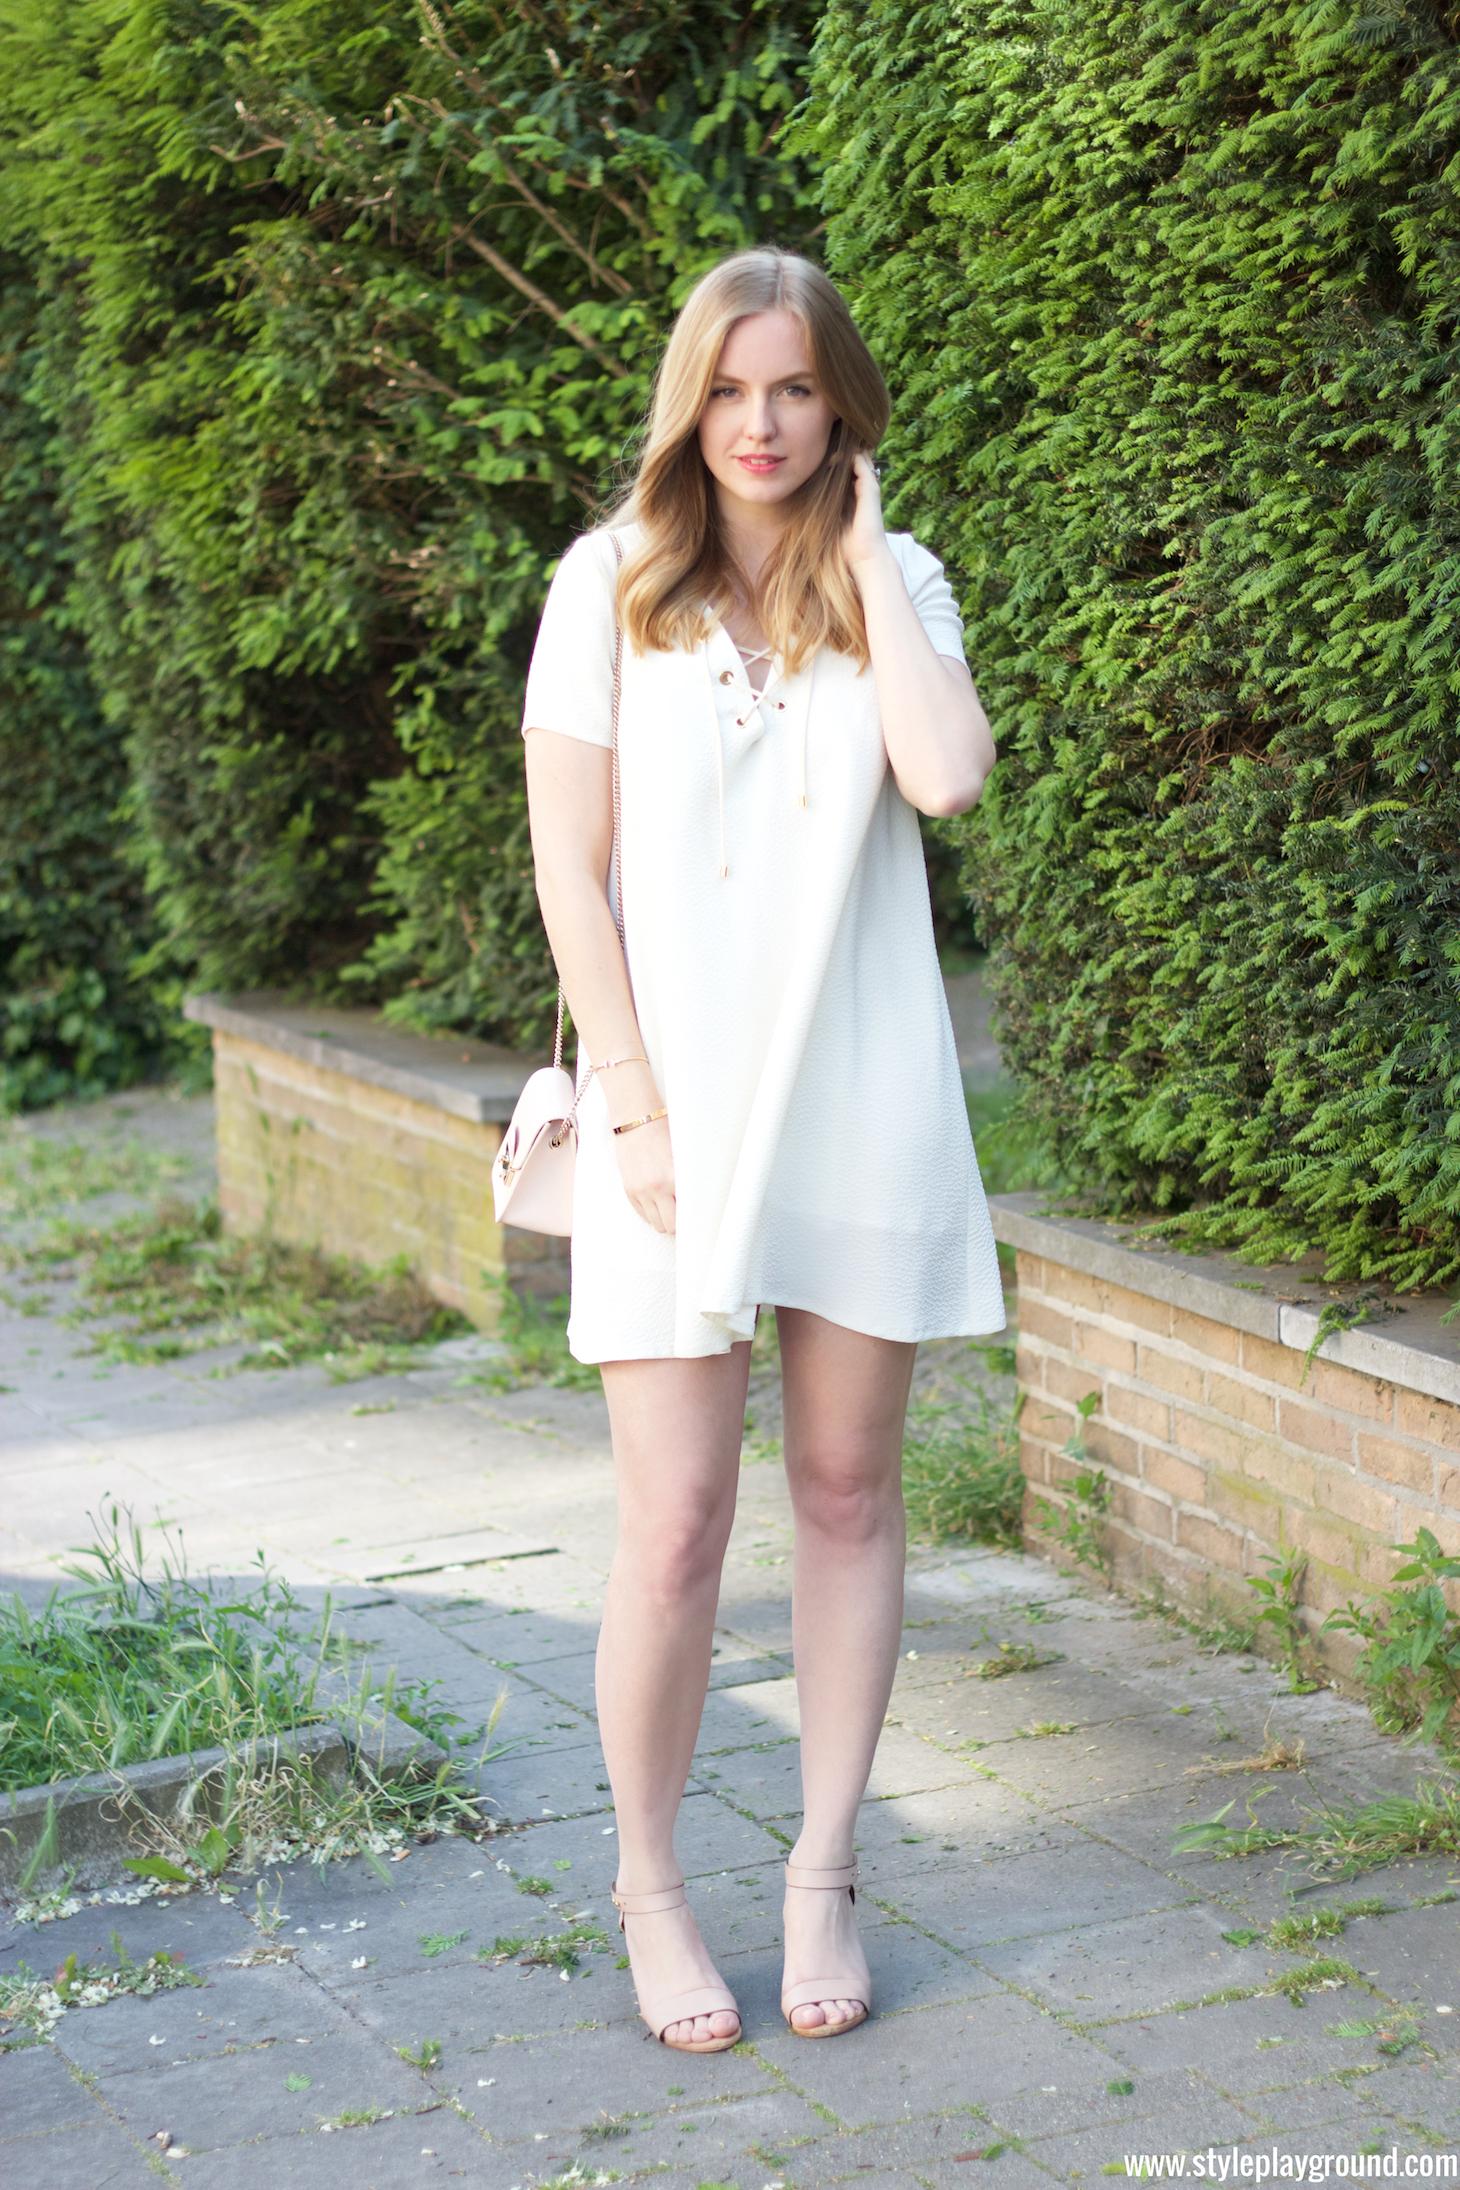 Axelle Blanpain of Styleplayground is wearing a dress from BASH, Furla mini metropolis bag, Mango shoes, Cartier love bracelet, Tiffany&Co T bracelet